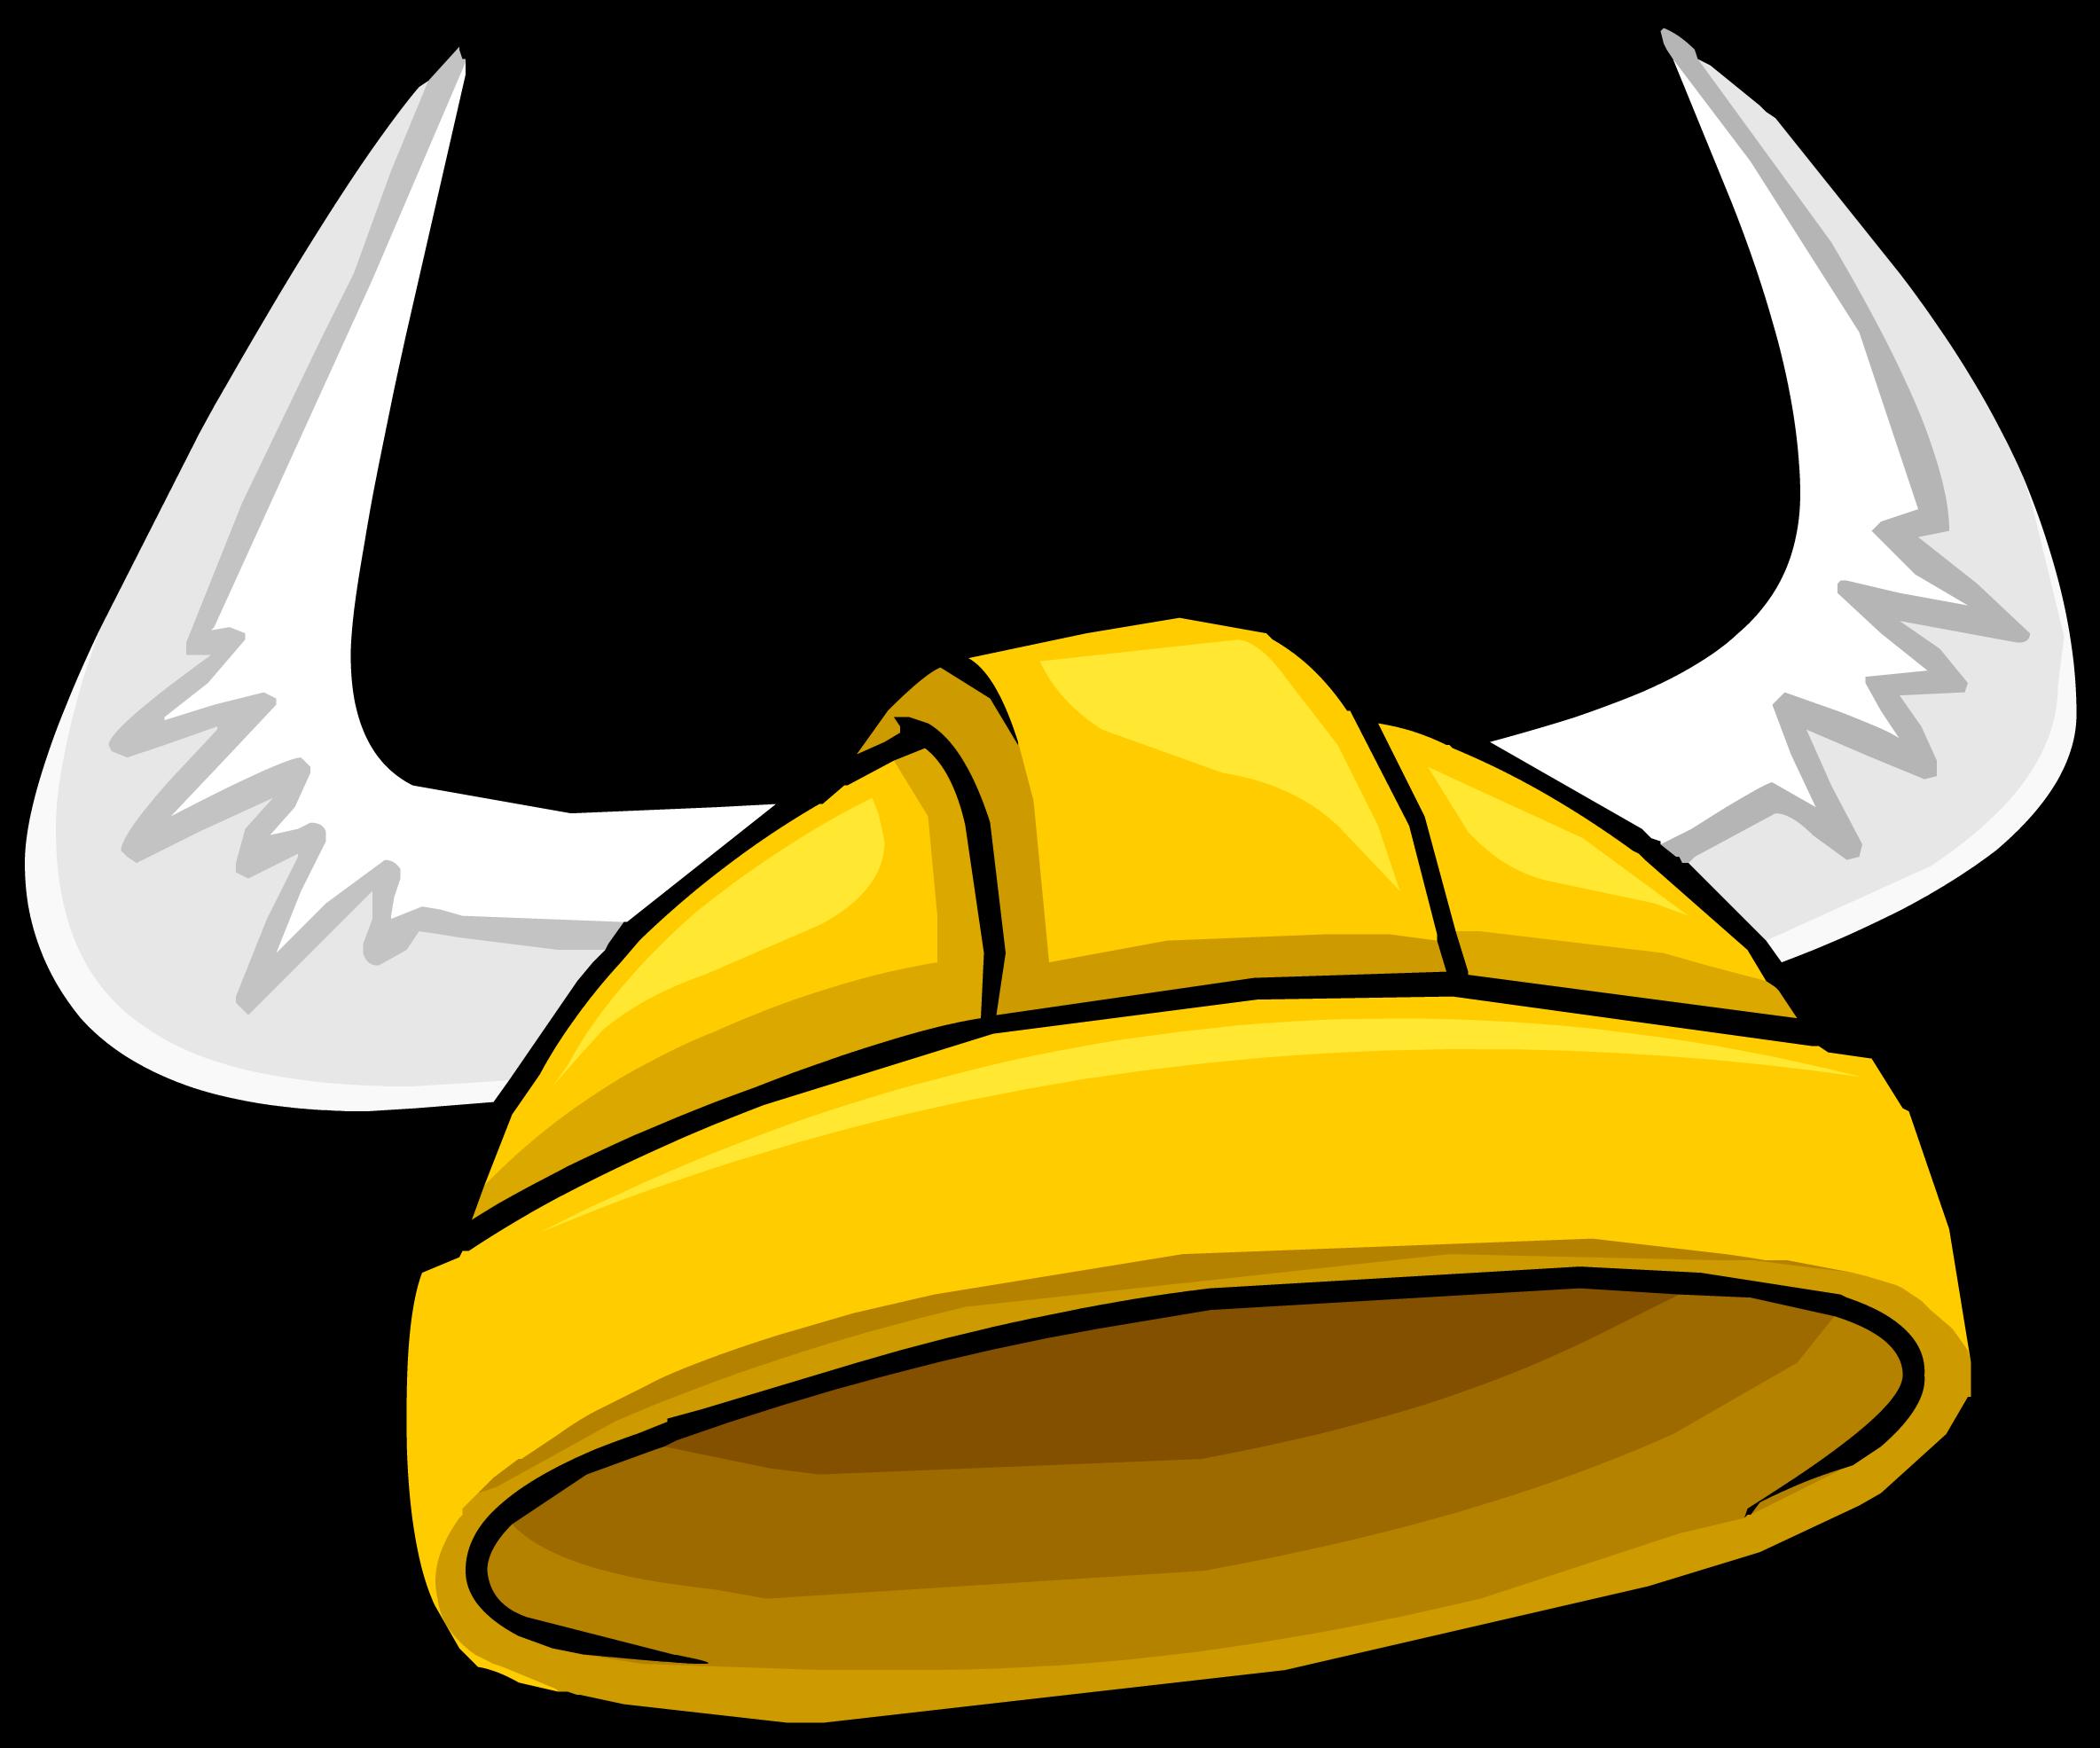 Warrior clipart viking. Gold helmet puffle hat